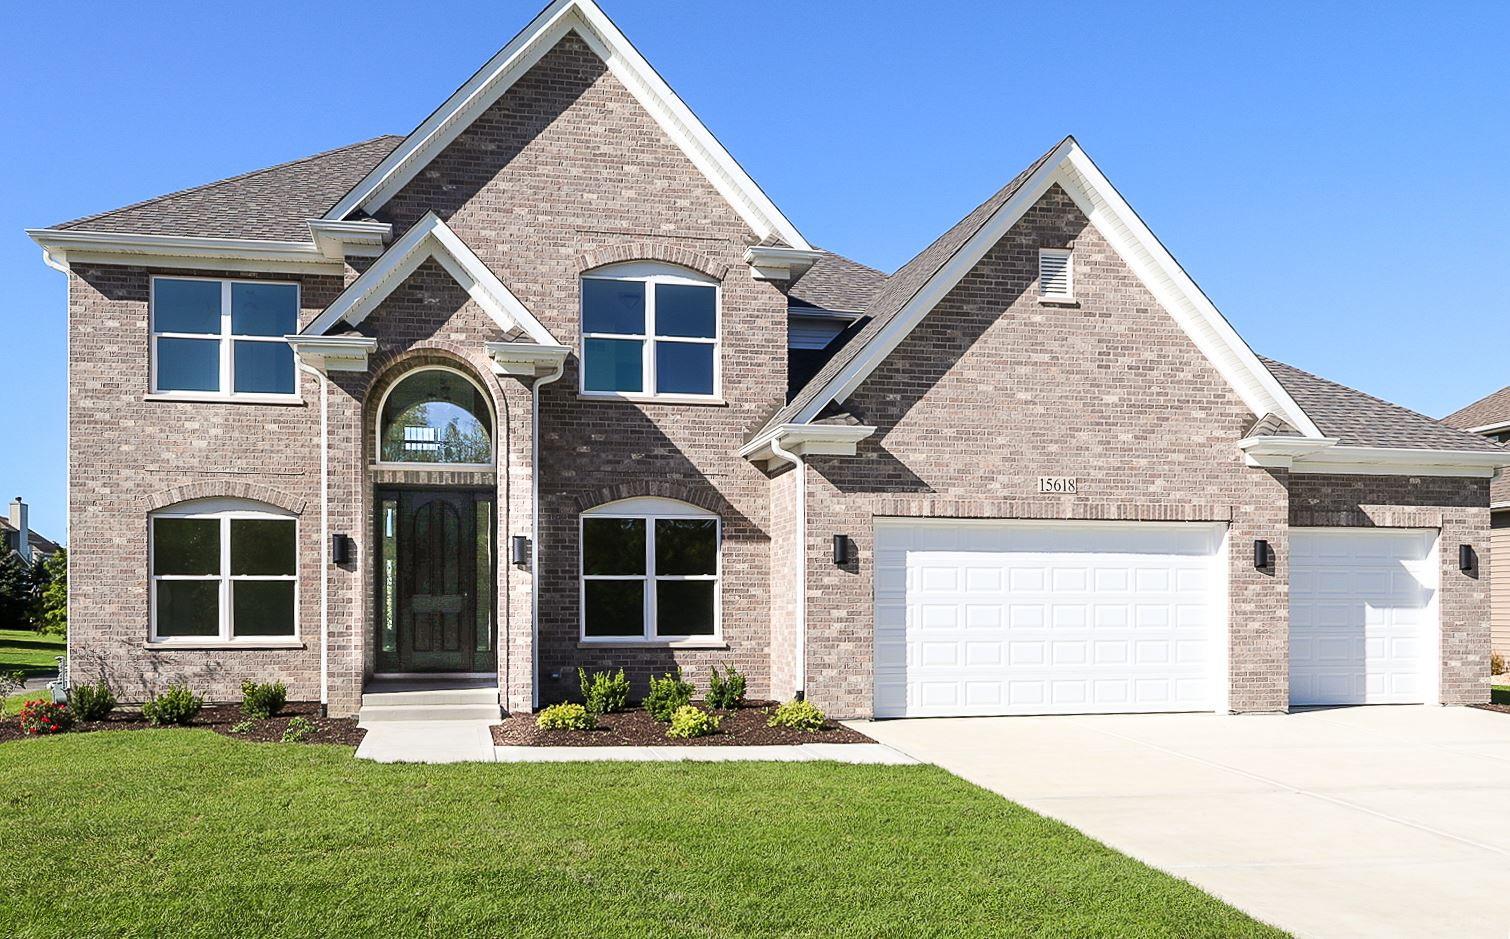 15618 Brookshore Drive, Plainfield, IL 60544 - #: 10681425